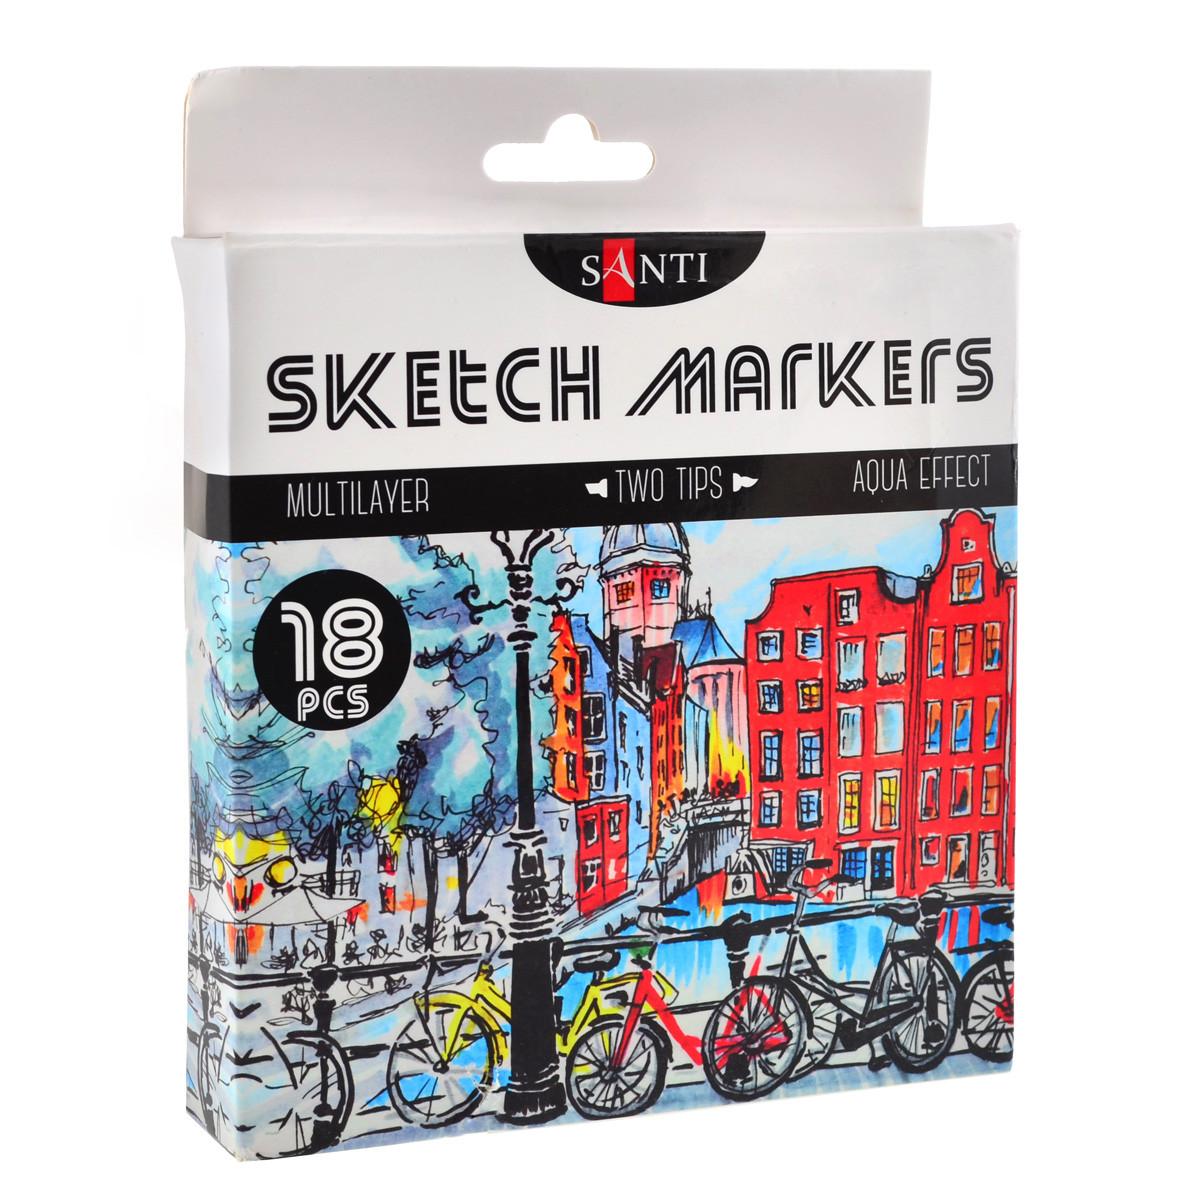 Набор скетч-маркеров для рисования двусторонних Santi sketchmarker , 18шт/уп     код: 390527